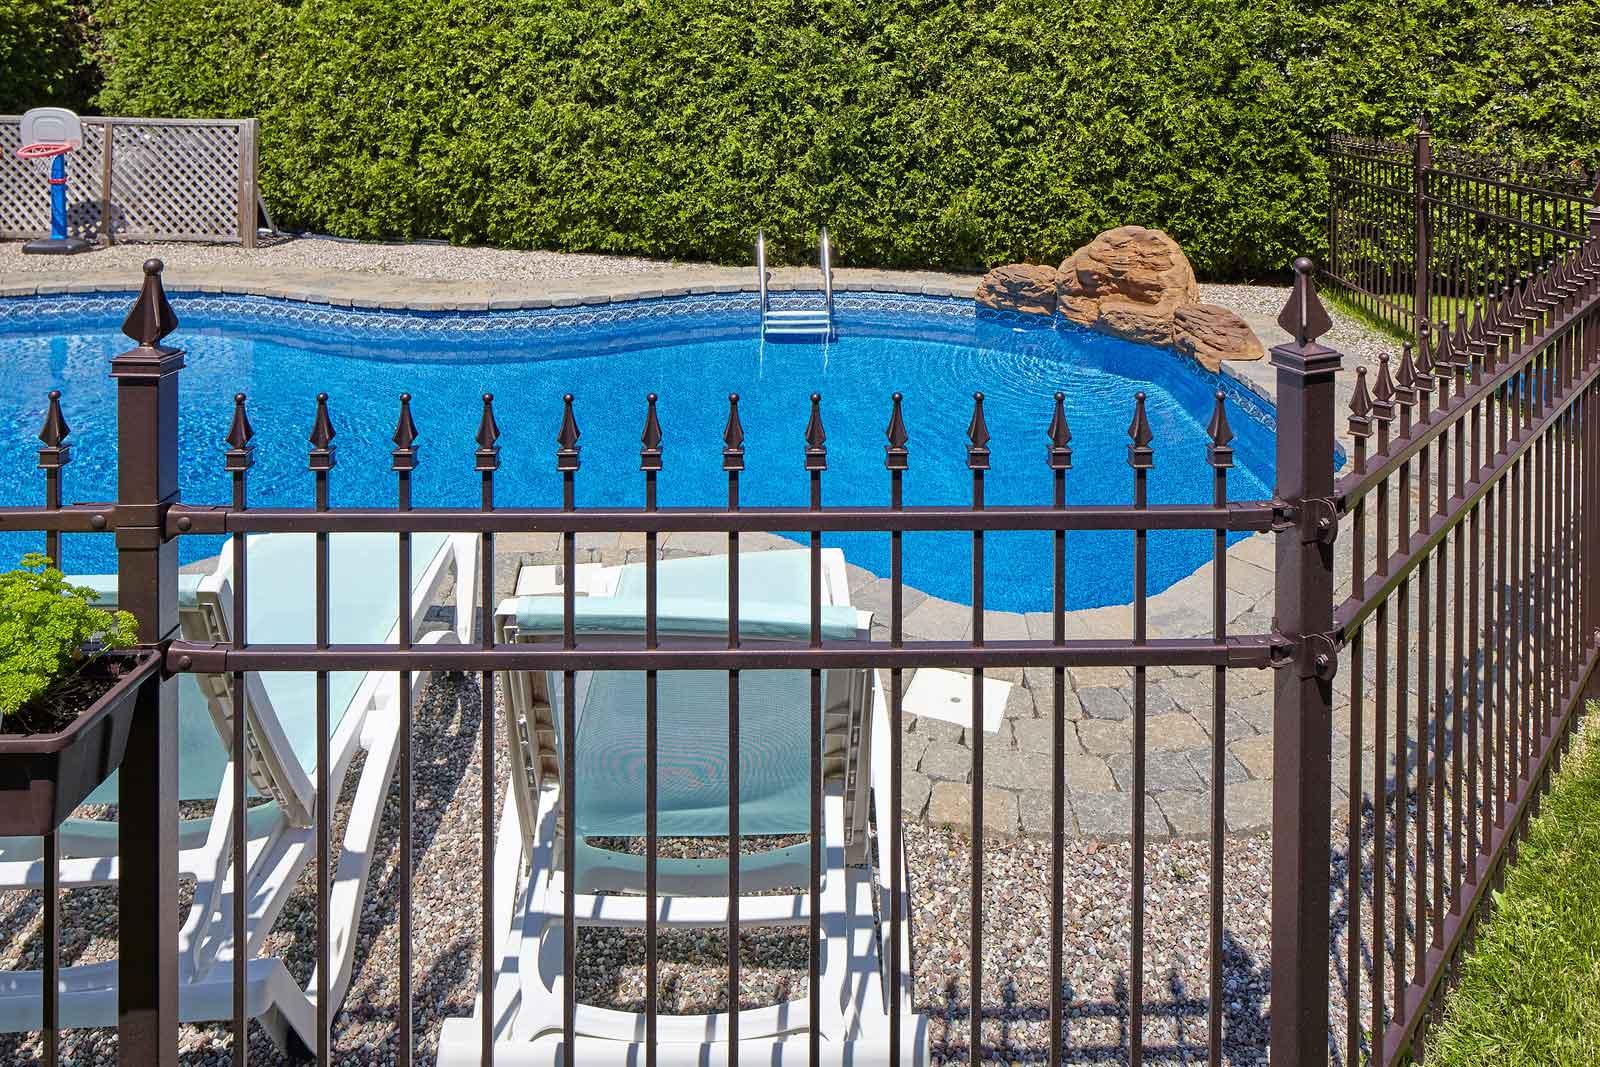 Ensure all backyard pools have fencing